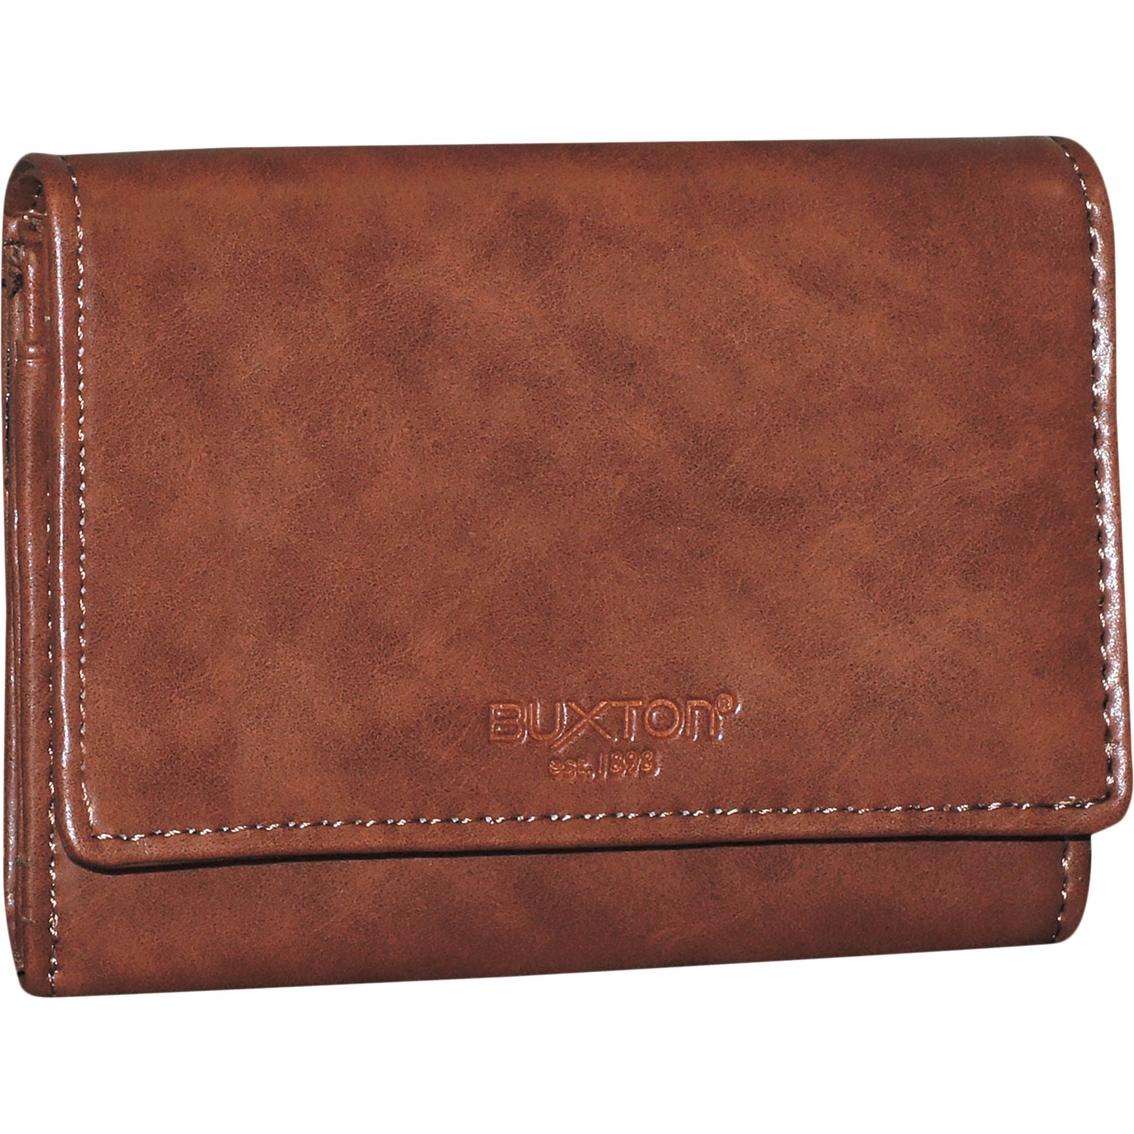 Buxton d type rfid business card holder wallets money clips buxton d type rfid business card holder colourmoves